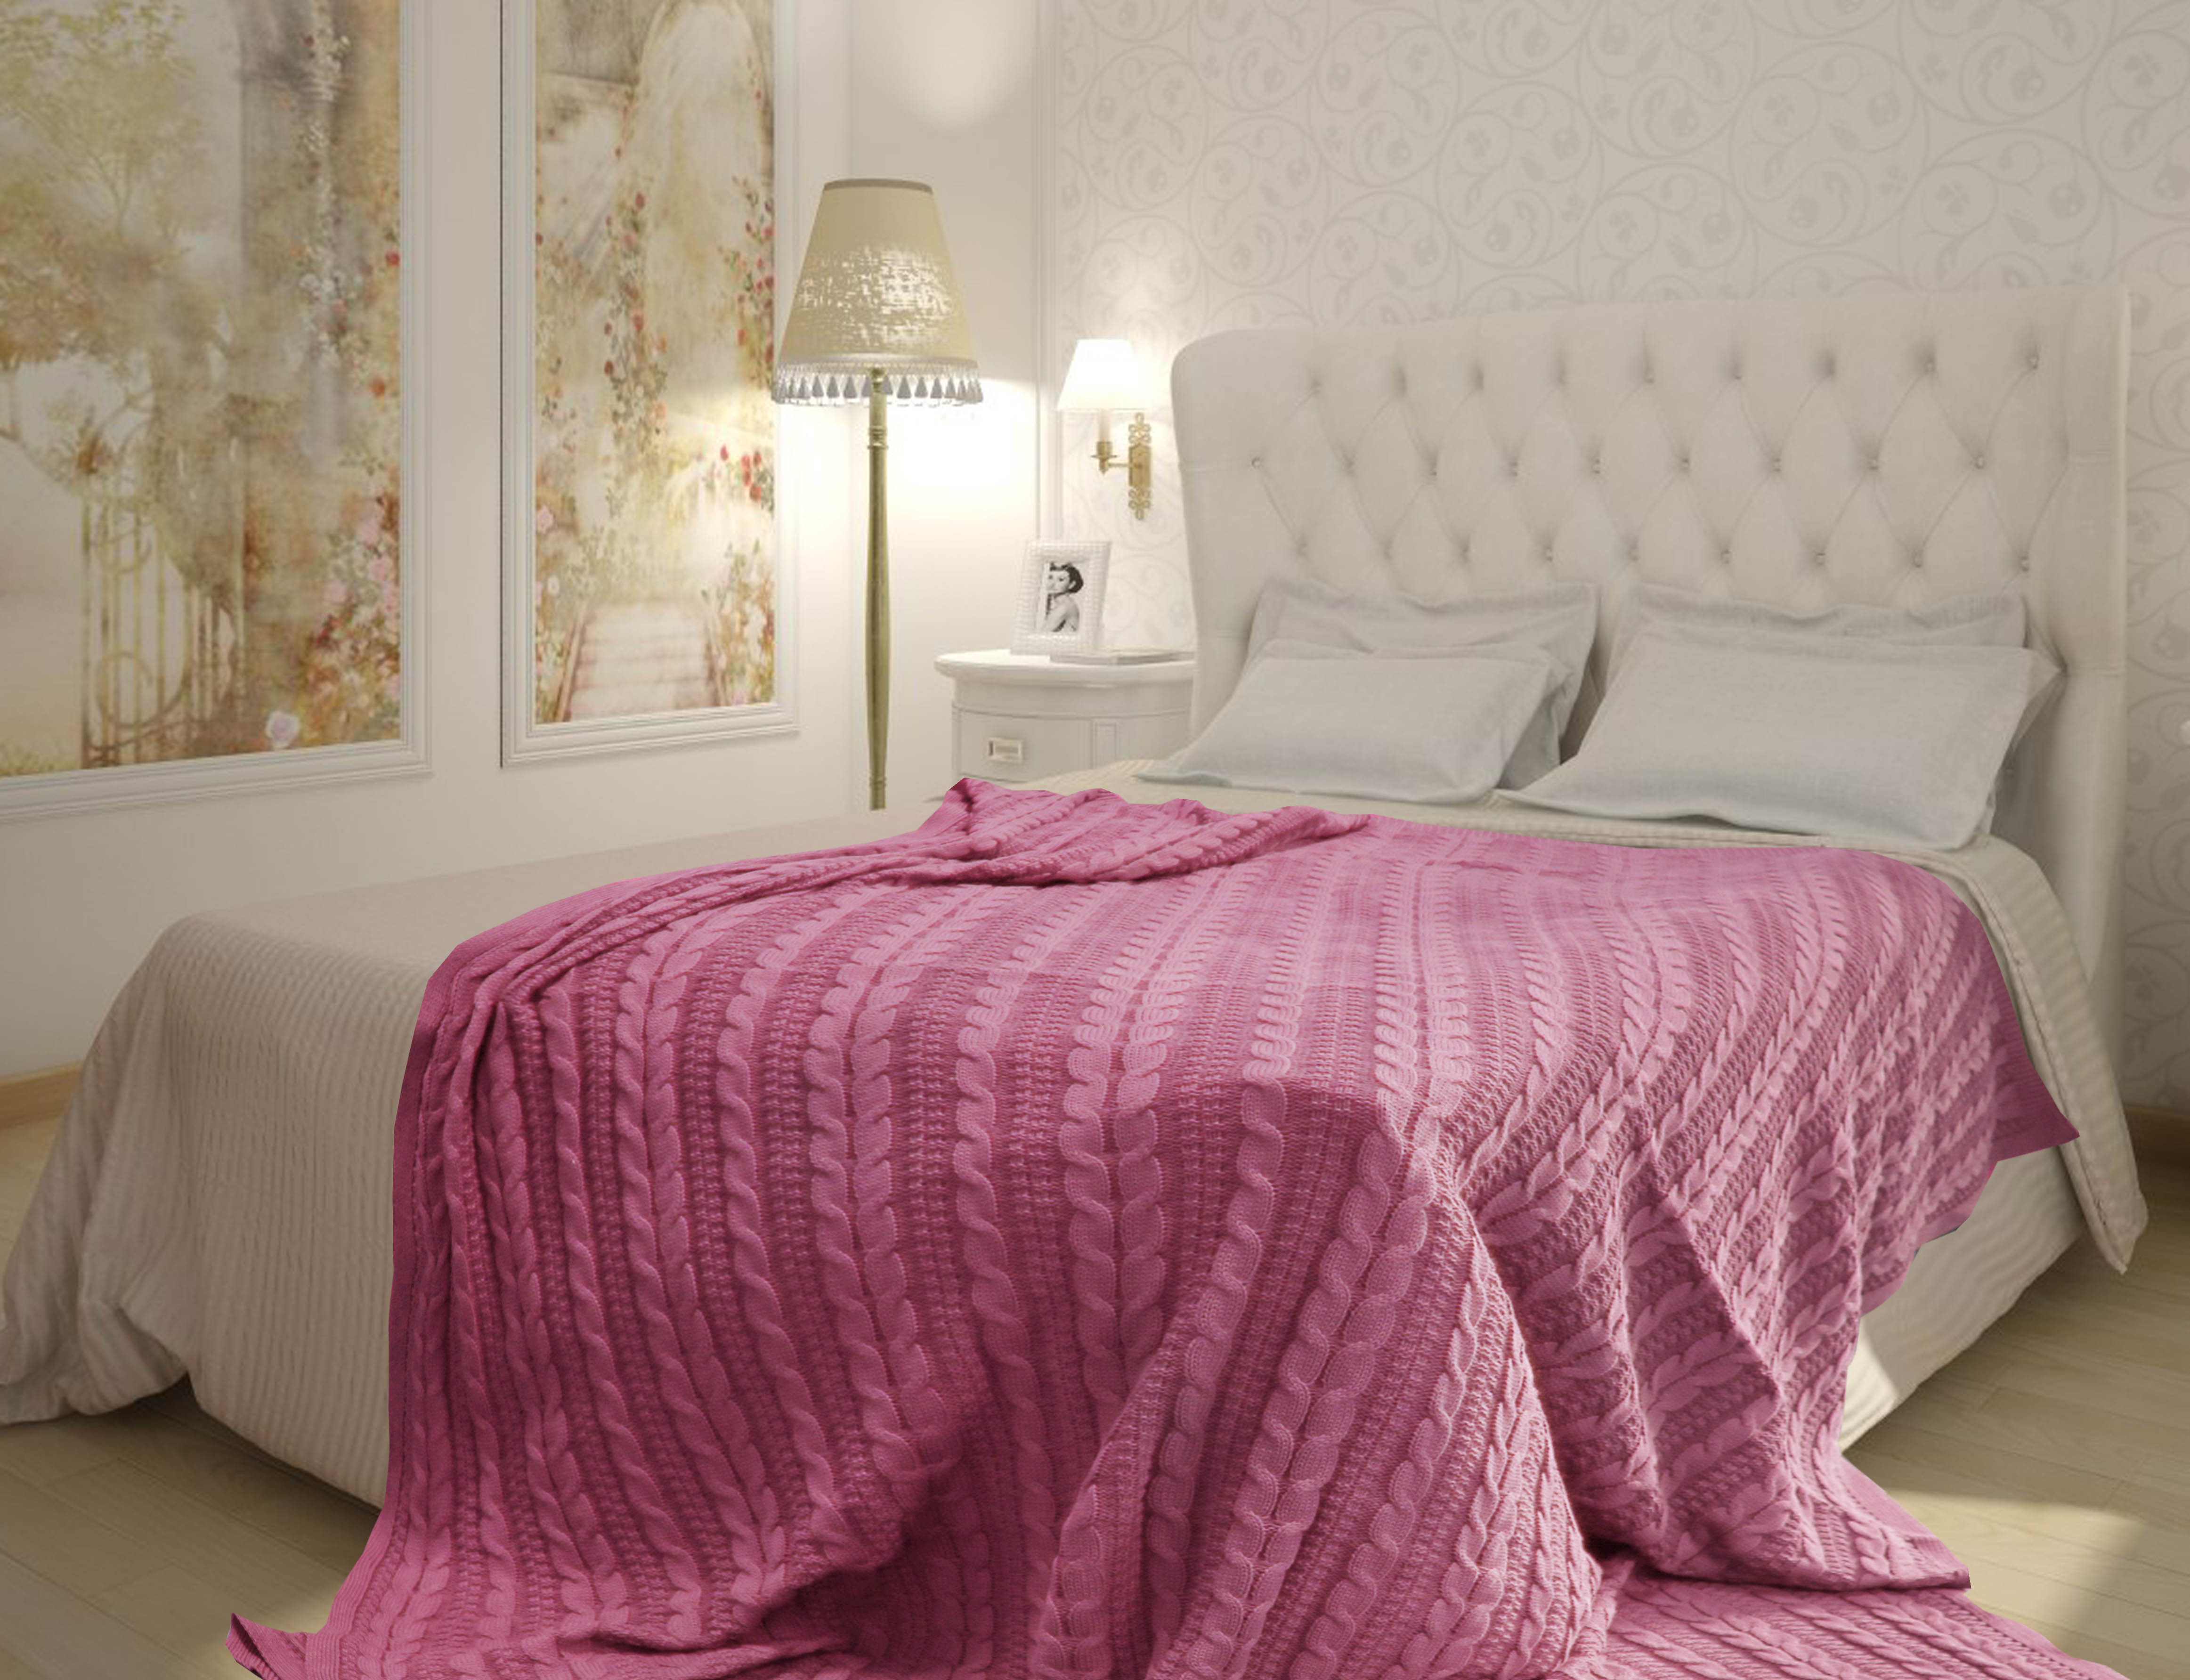 Пледы и покрывала Buenas Noches Плед Braid Цвет: Розовый (150х200 см) плед bella casa плед коралл цвет розовый 150х200 см